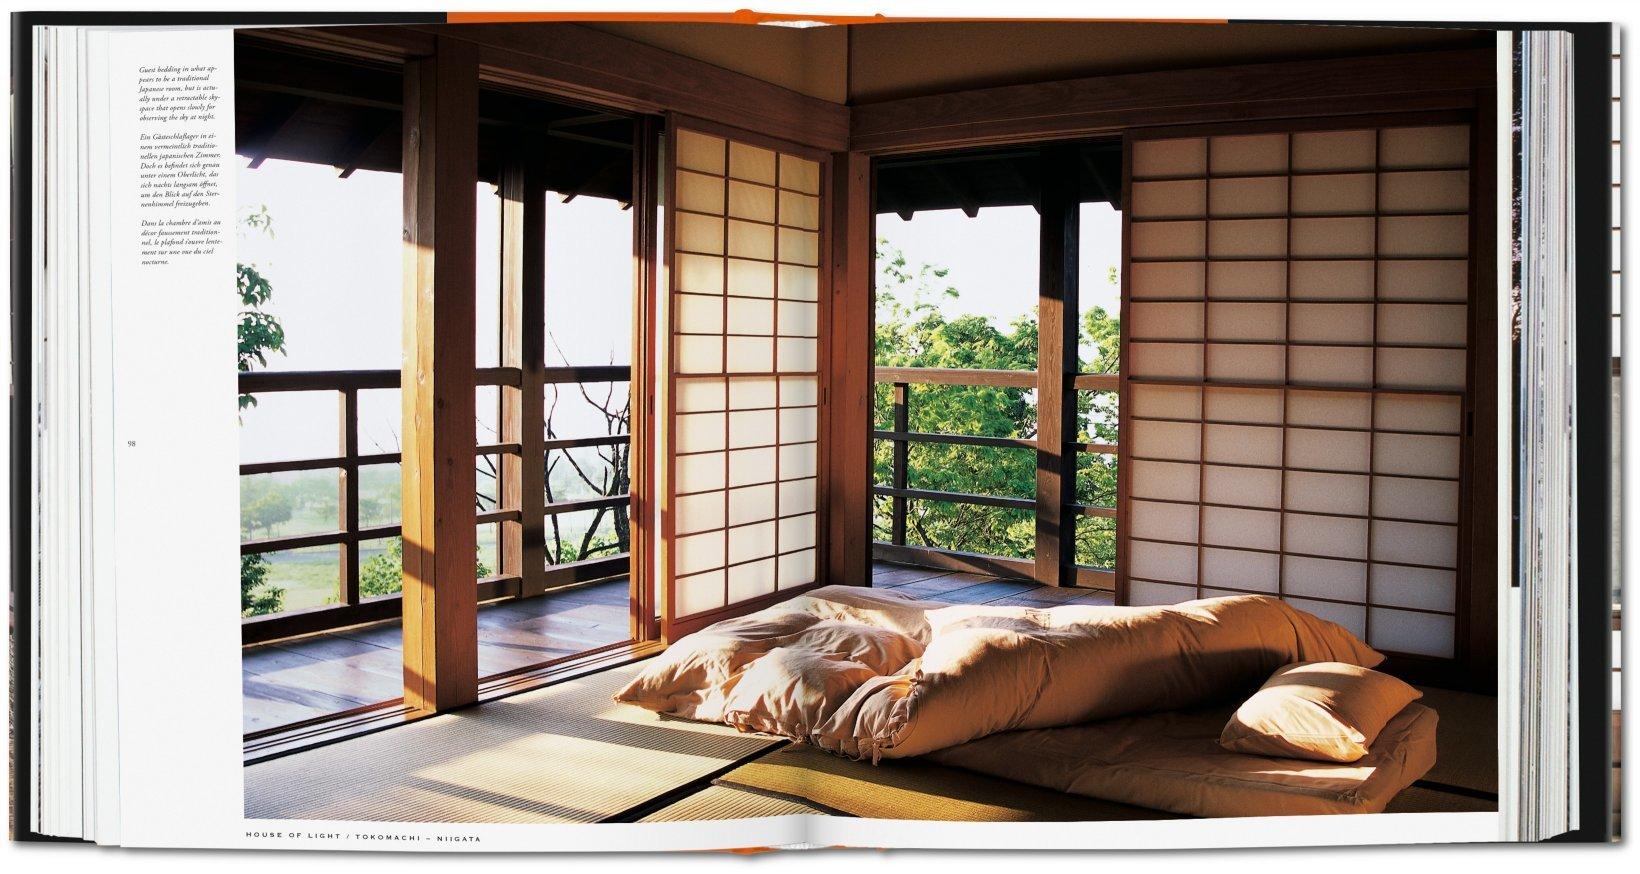 25_living_in_japan_va_int_open_0098_0099_44951_1501211342_id_875658.jpg